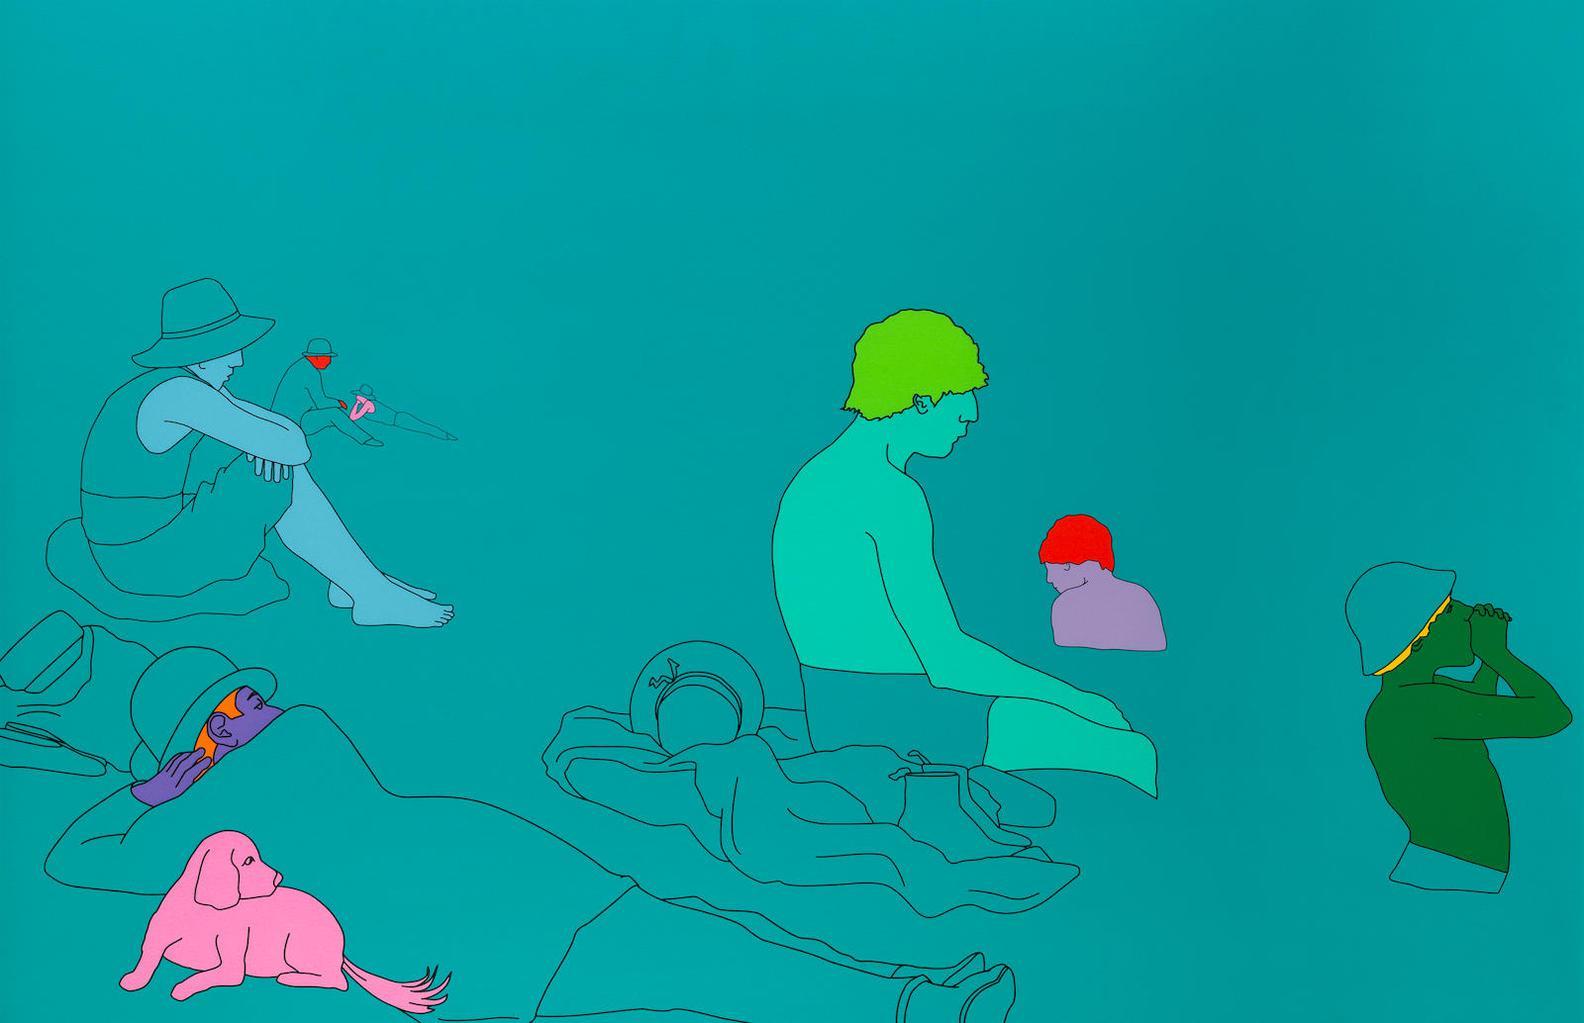 Michael Craig-Martin-Deconstructing Seurat (Turquoise Green)-2004